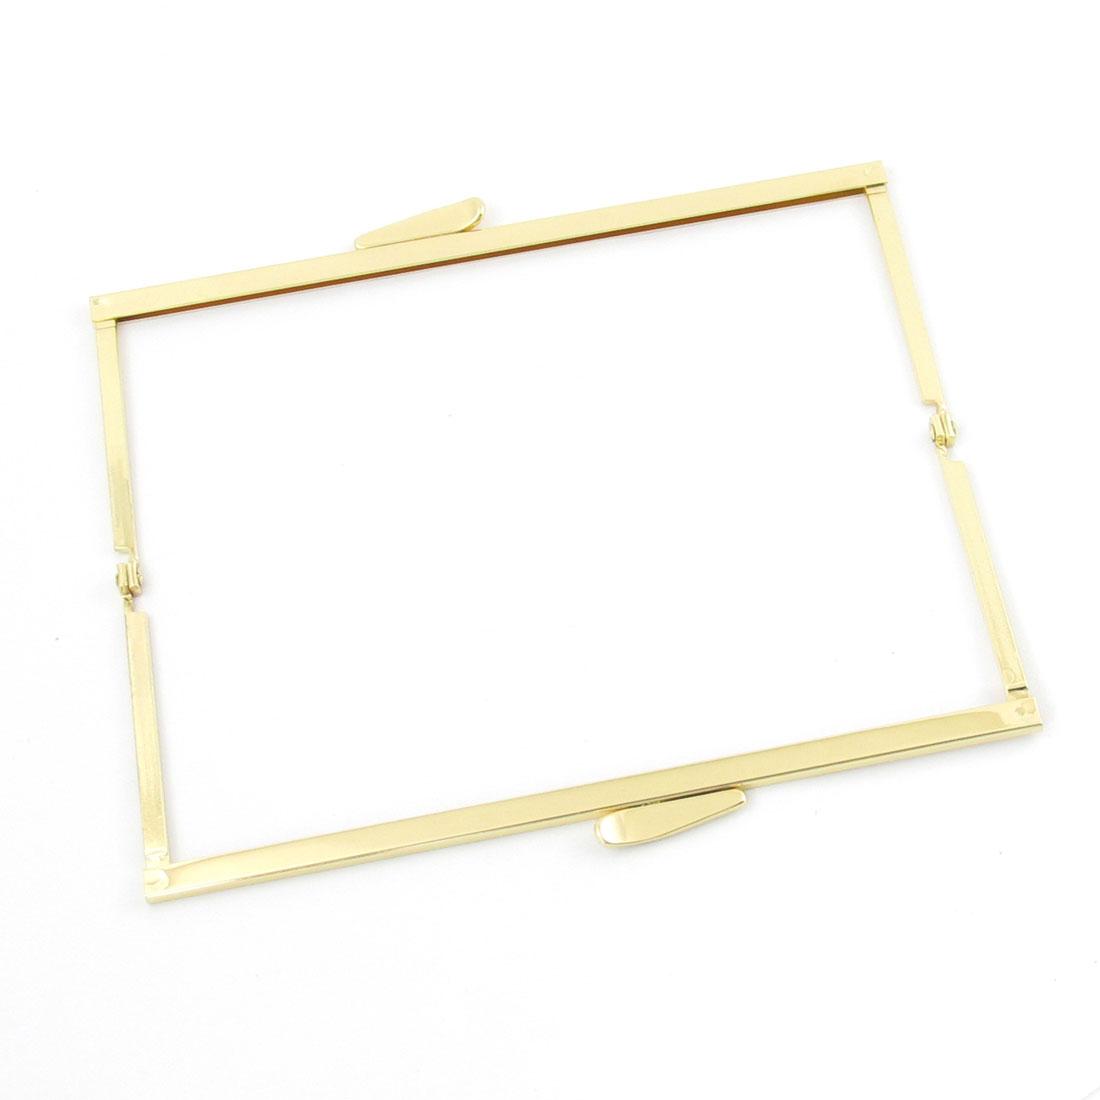 "Gold Tone Metallic Kiss Lock Clasp Closure Purse Frame 7"" Long"